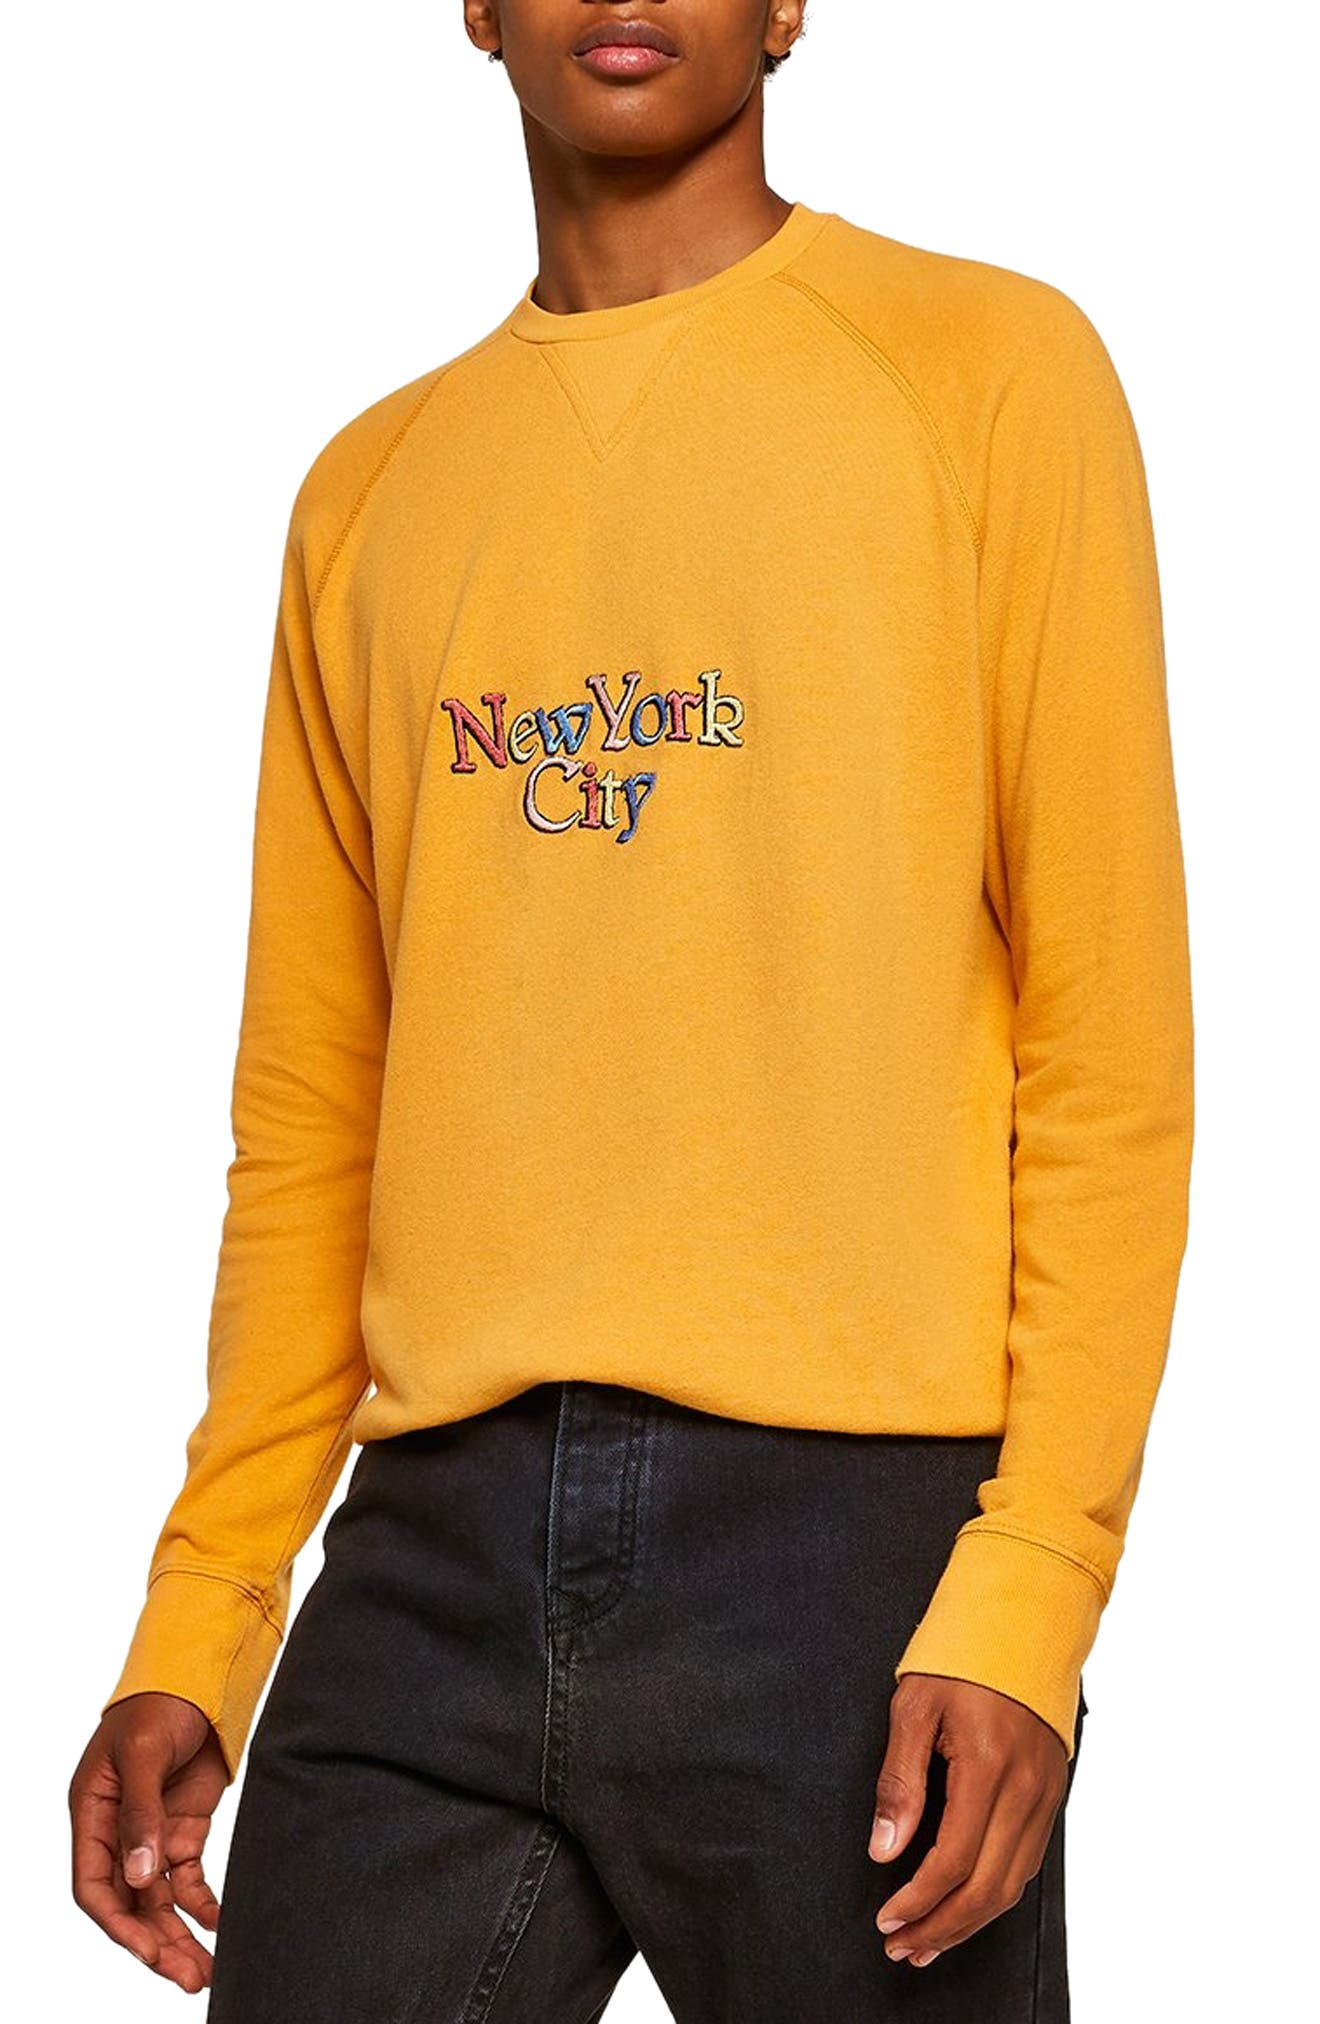 New York Classic Sweater,                             Main thumbnail 1, color,                             700